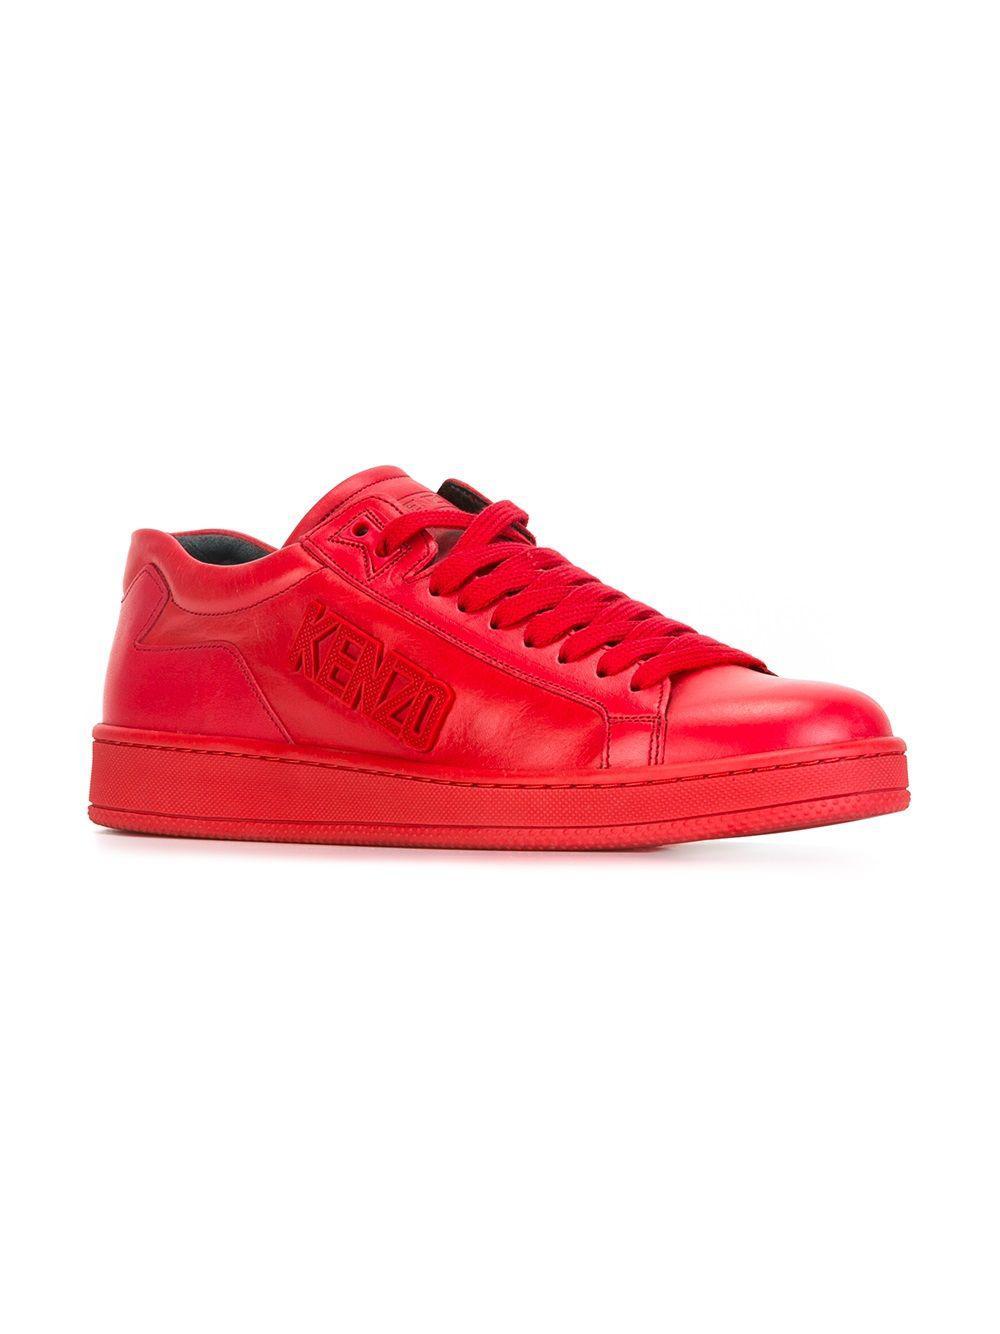 KENZO Leather Tenniz Sneakers